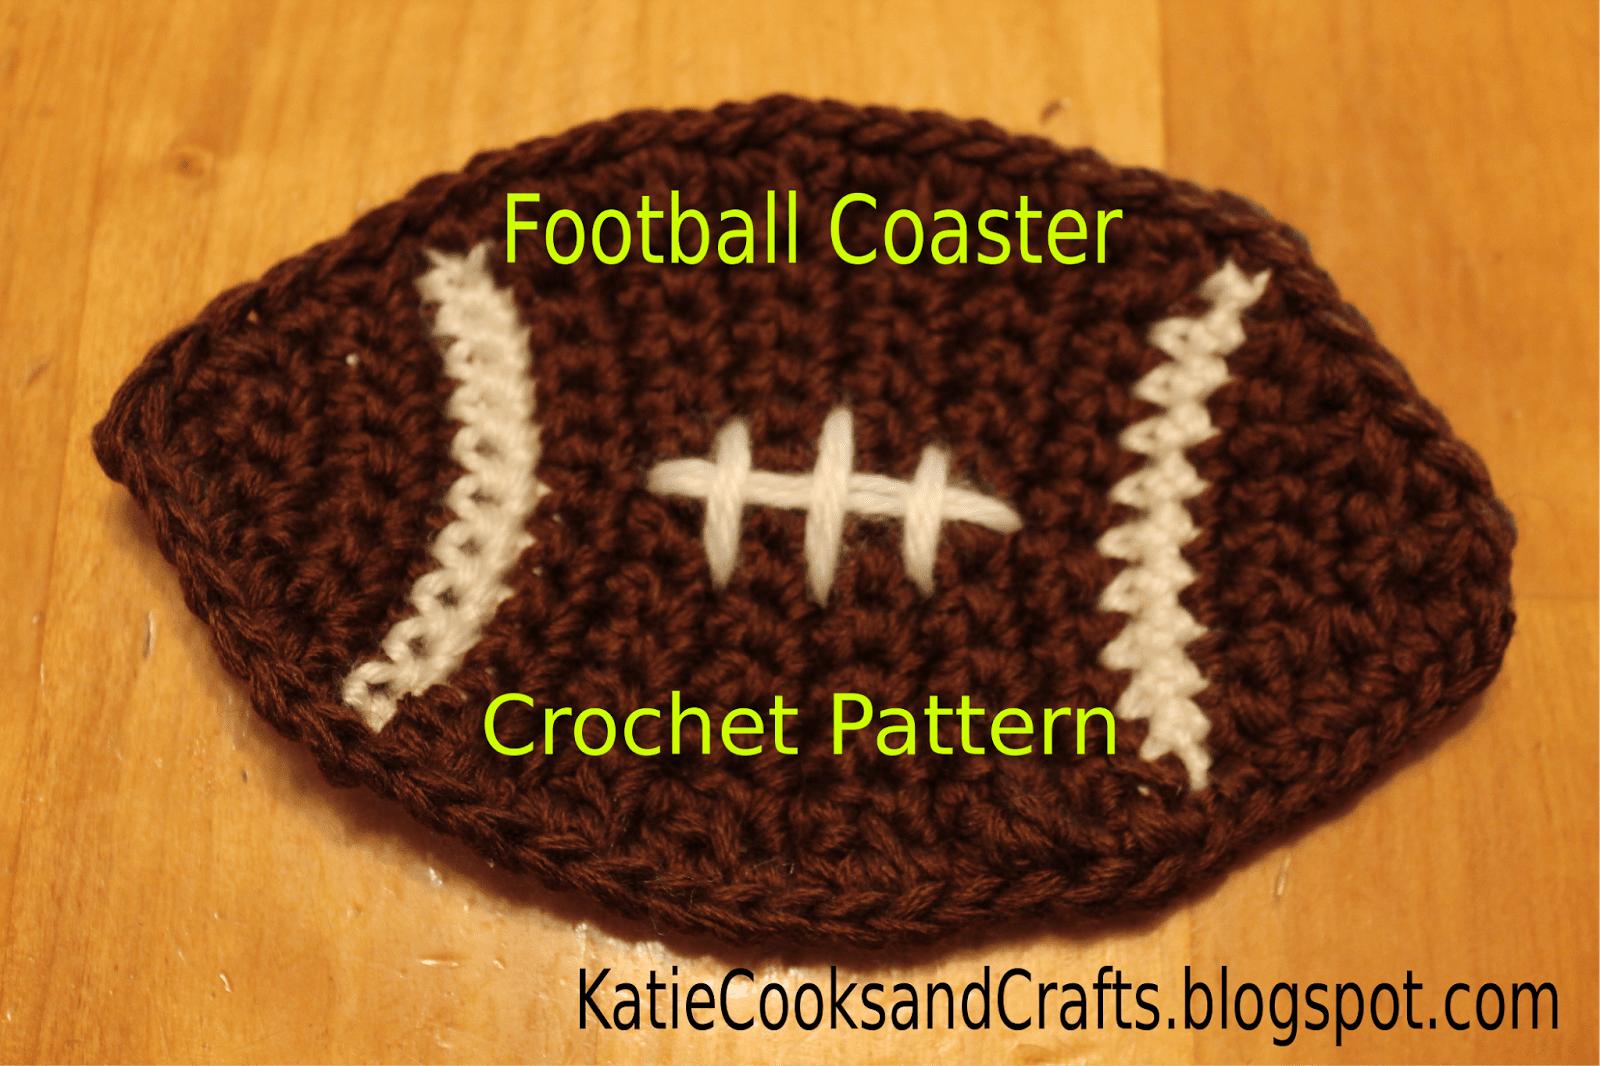 Football Coaster Free Crochet Pattern